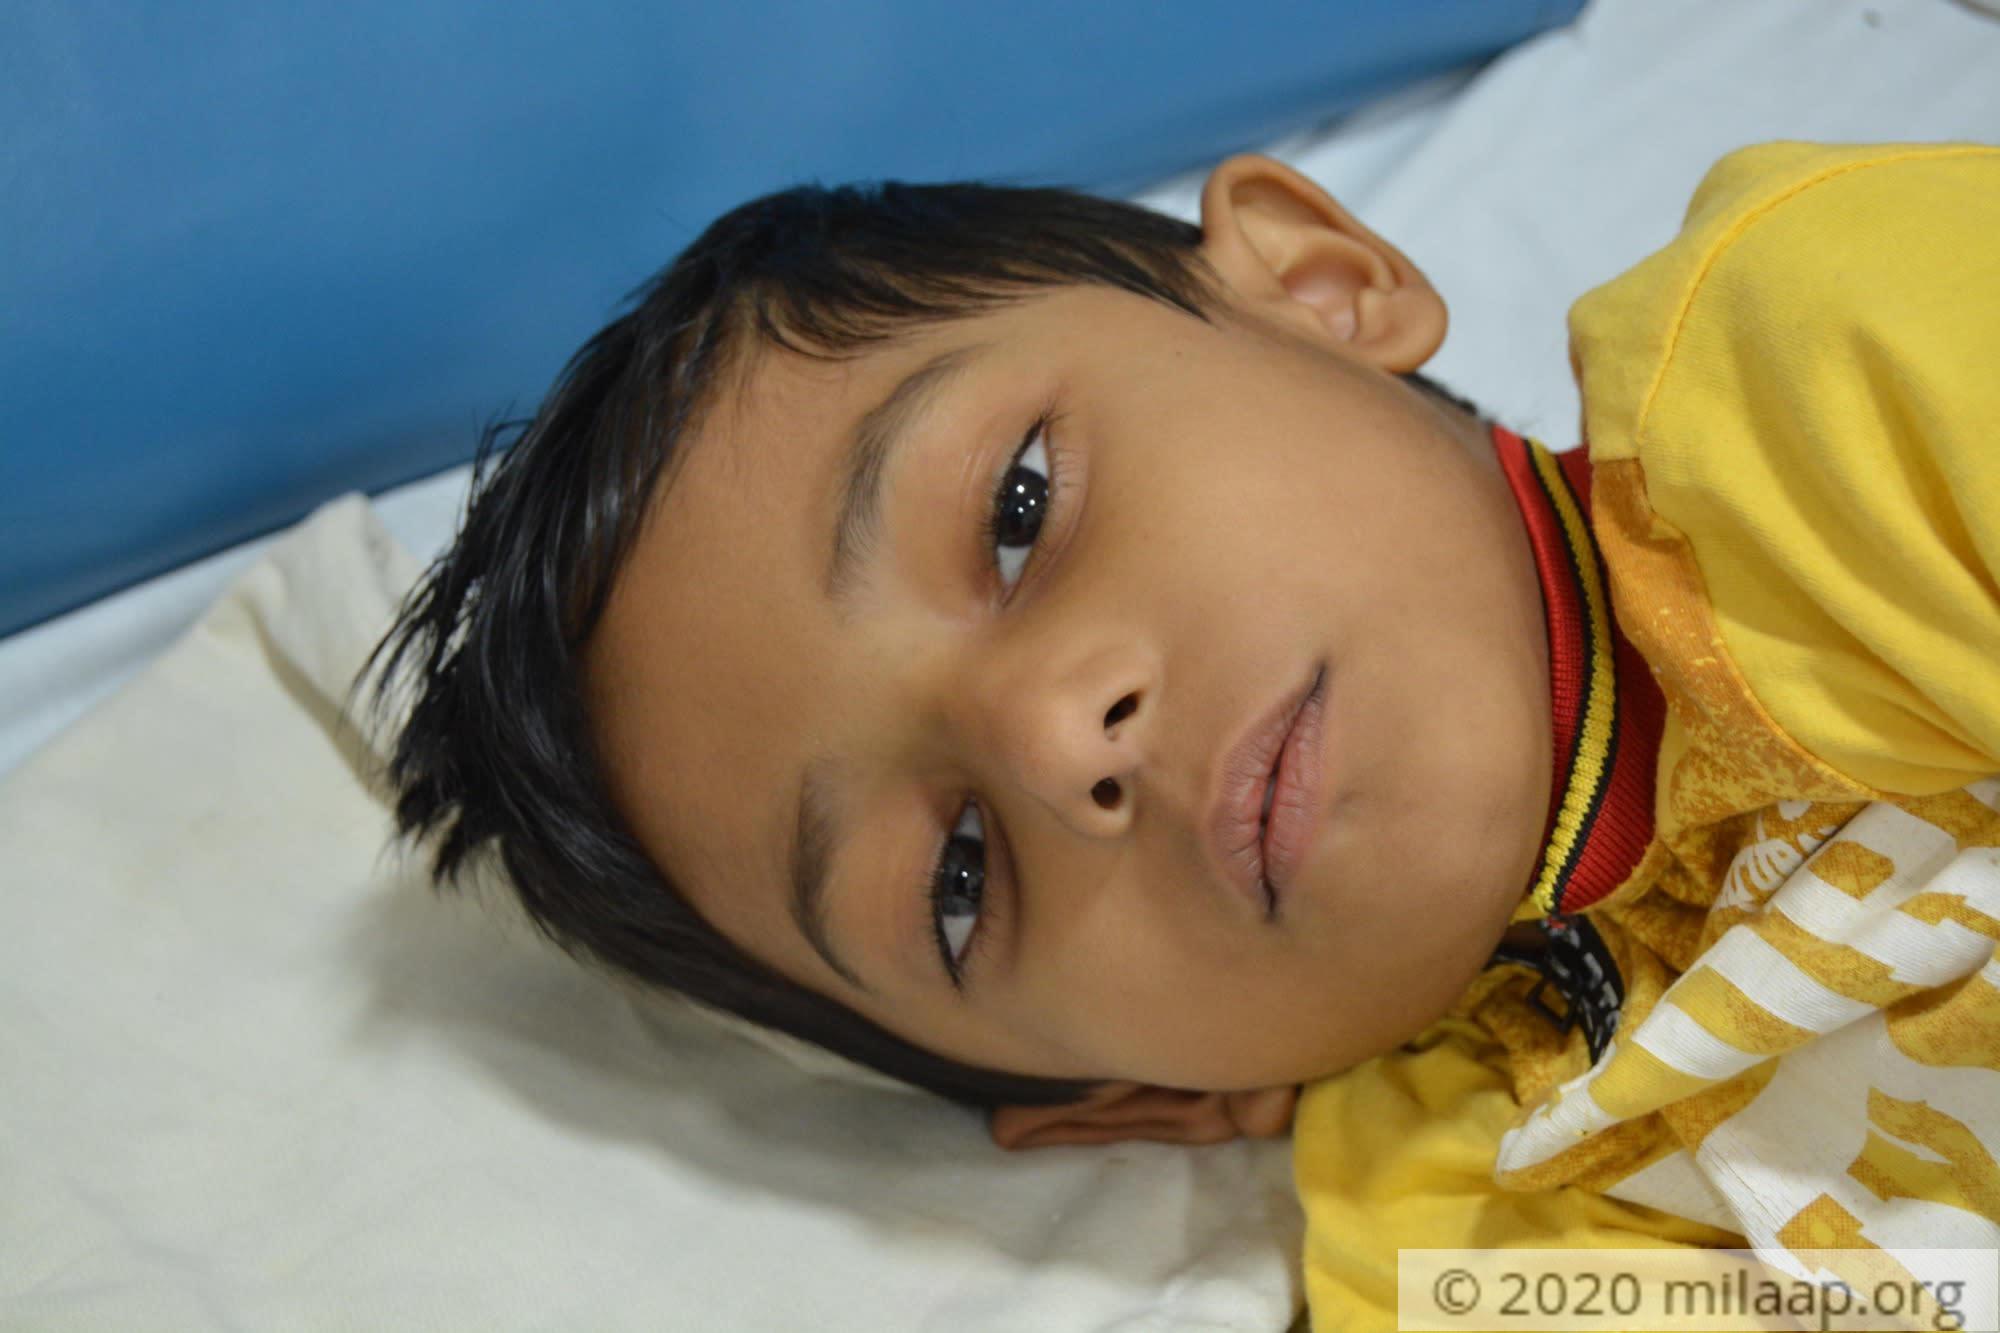 Shayan mcgm 01 thooid 1576055772